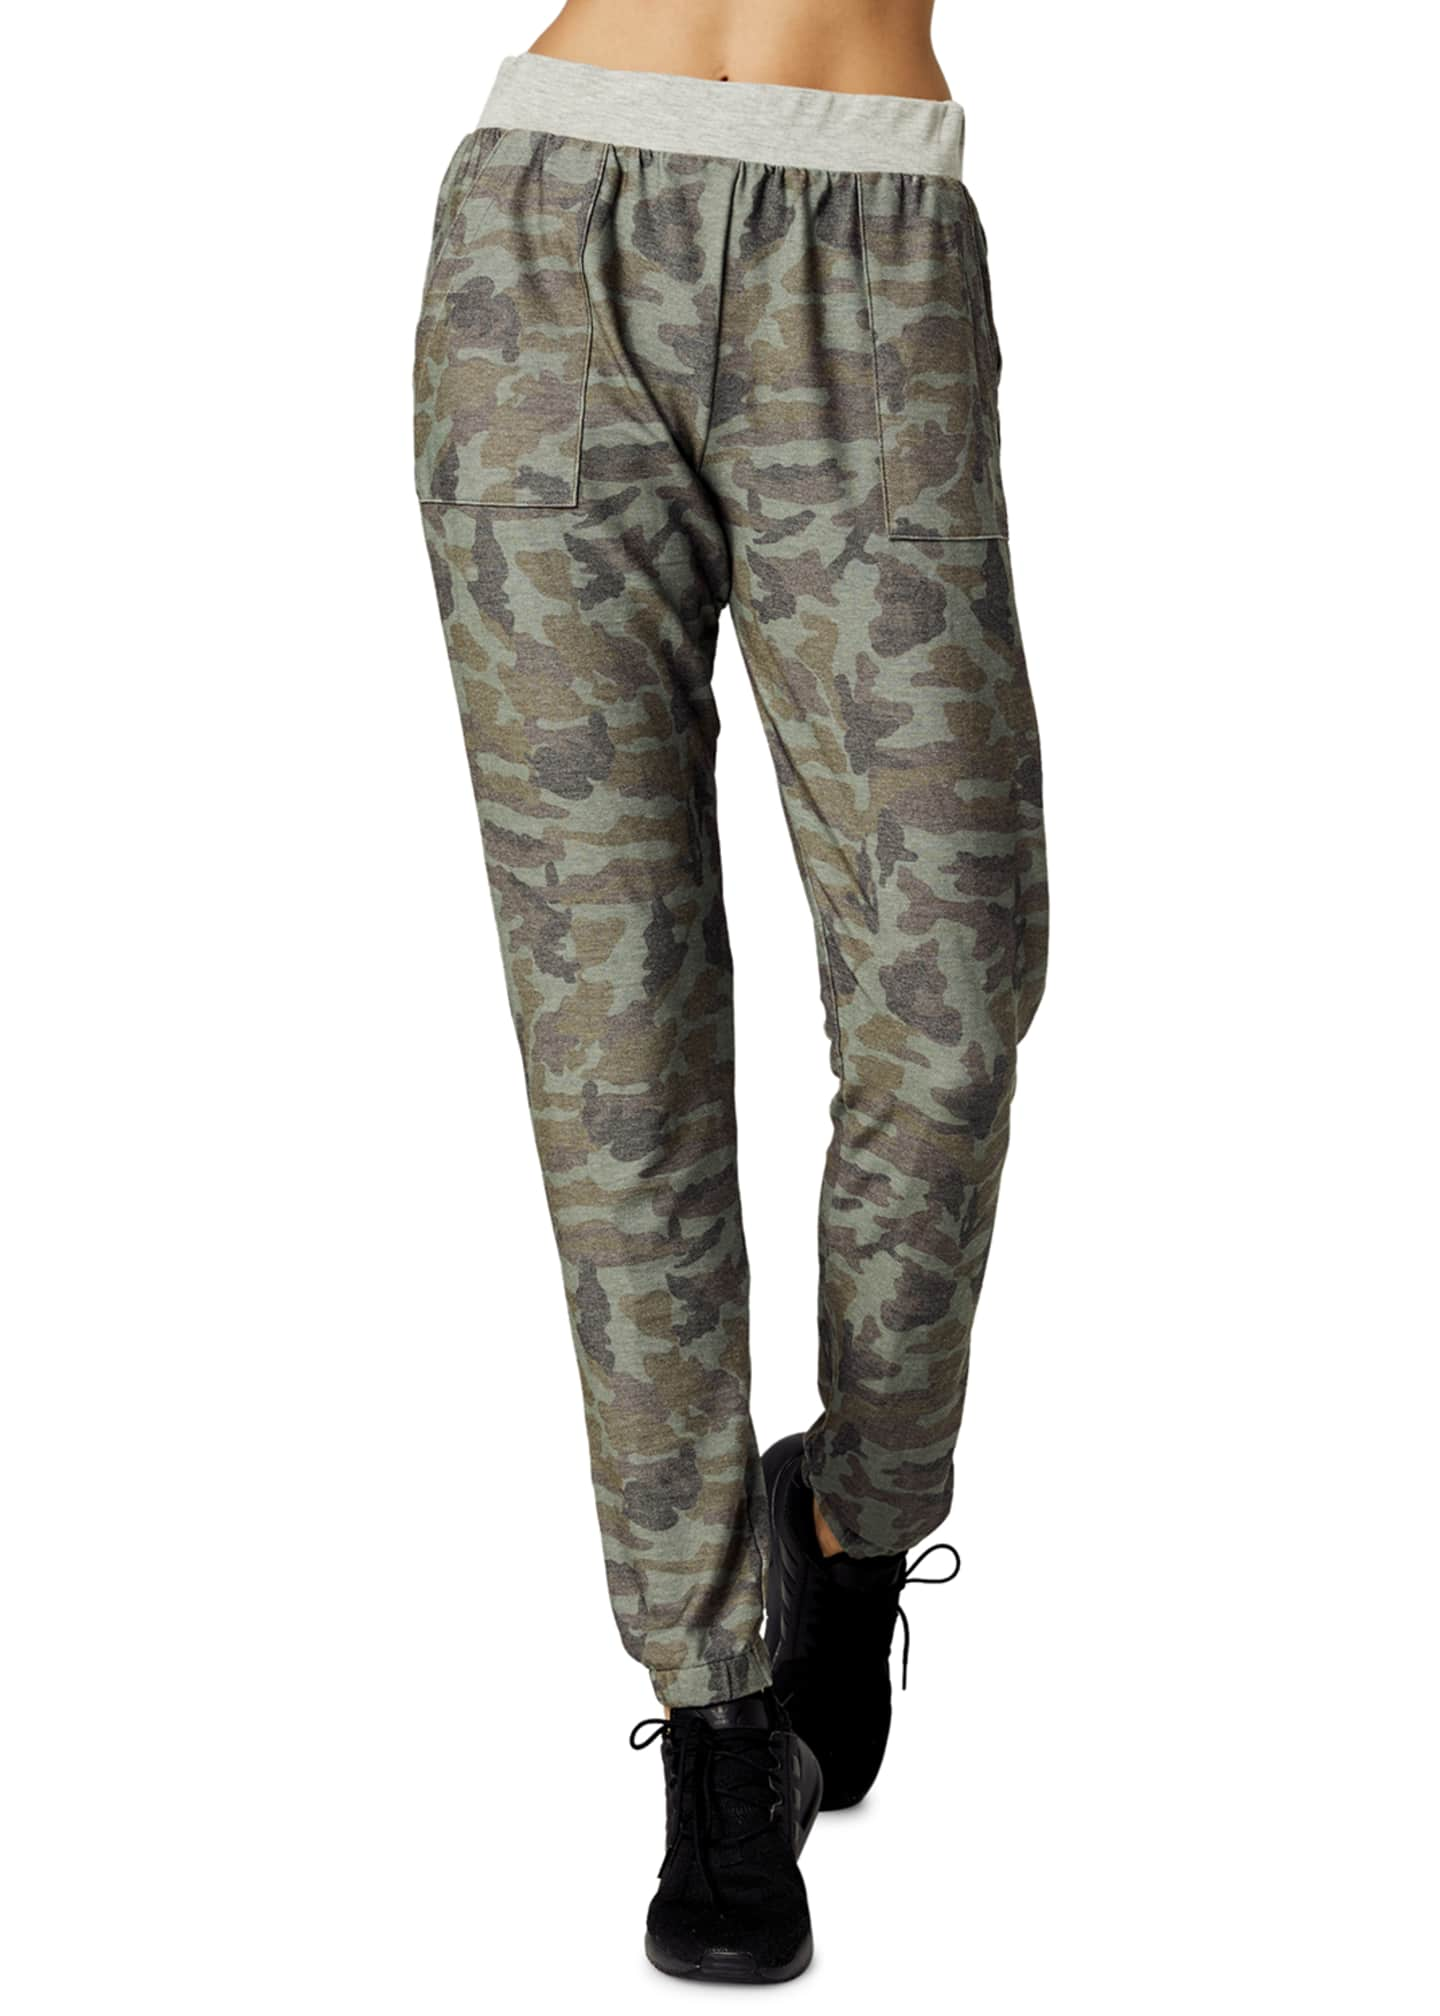 Body Language Sportswear Harlow Camo-Print Jogger Pants